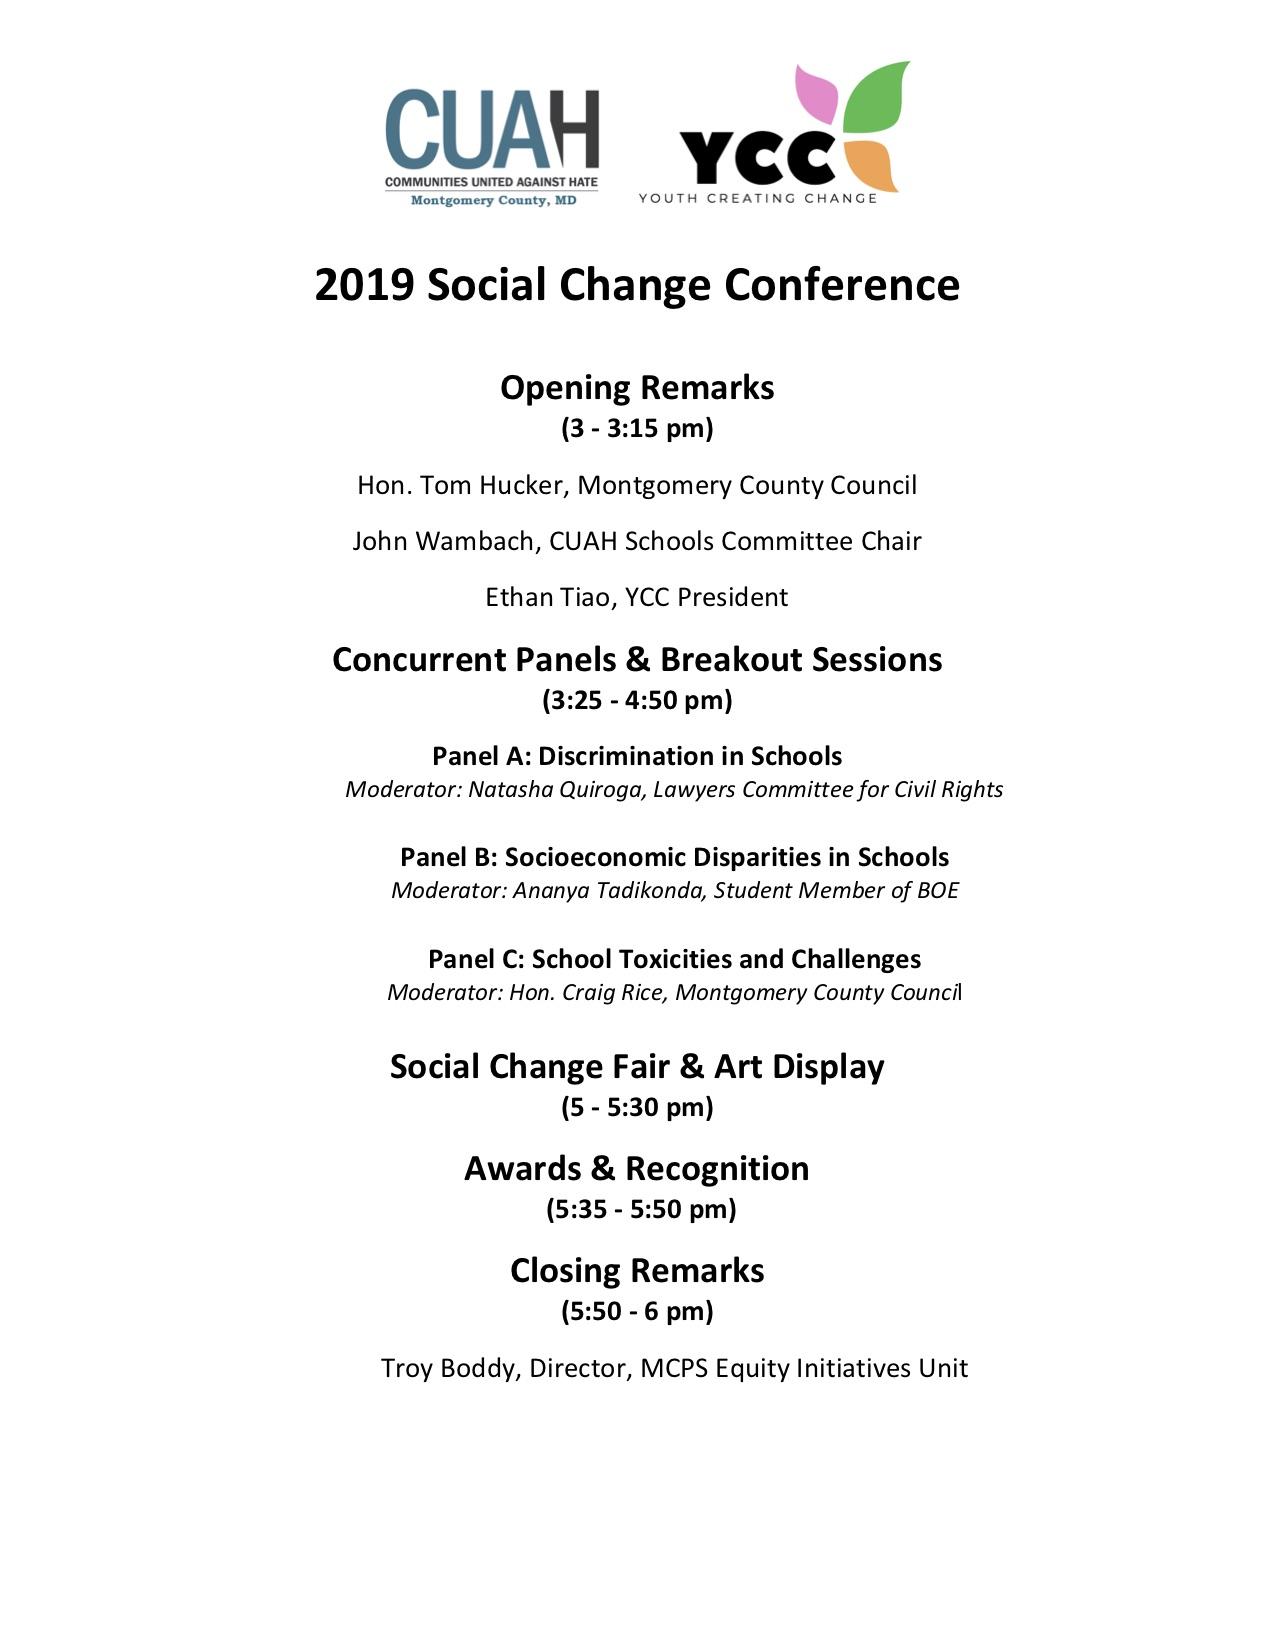 YCC Social Change Conference Program (1).jpg